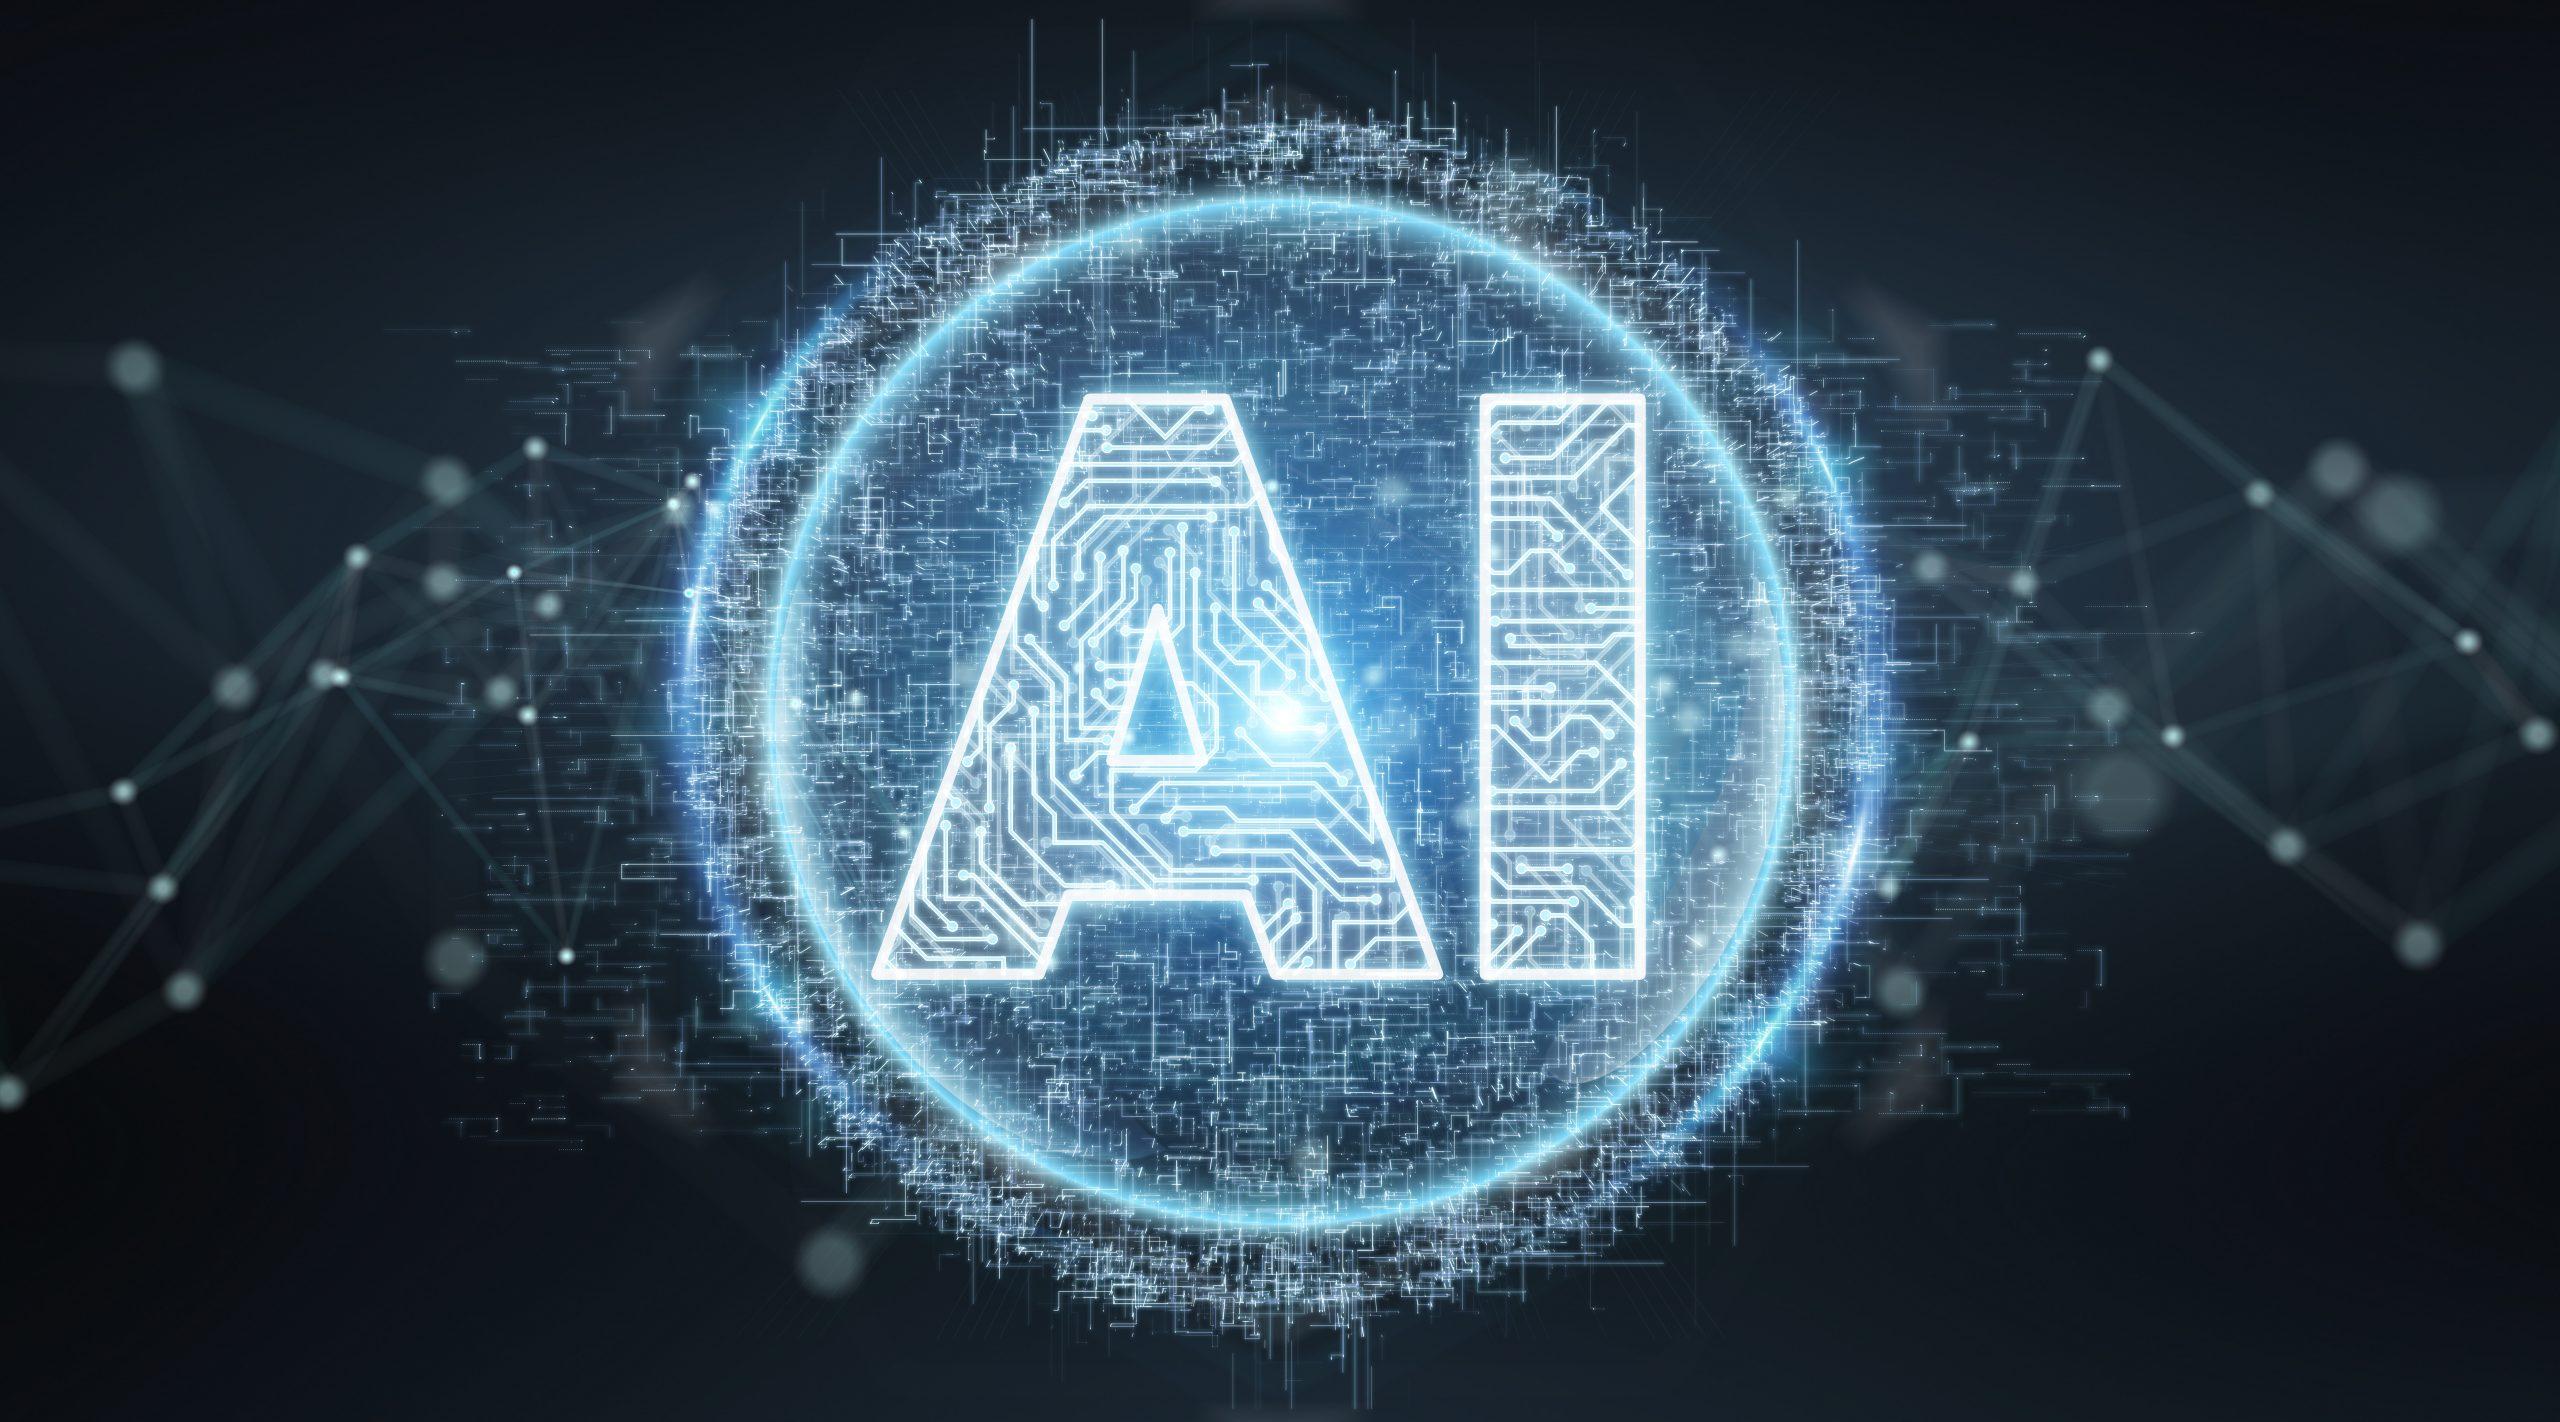 https://depositphotos.com/207844888/stock-photo-digital-artificial-intelligence-text-hologram.html